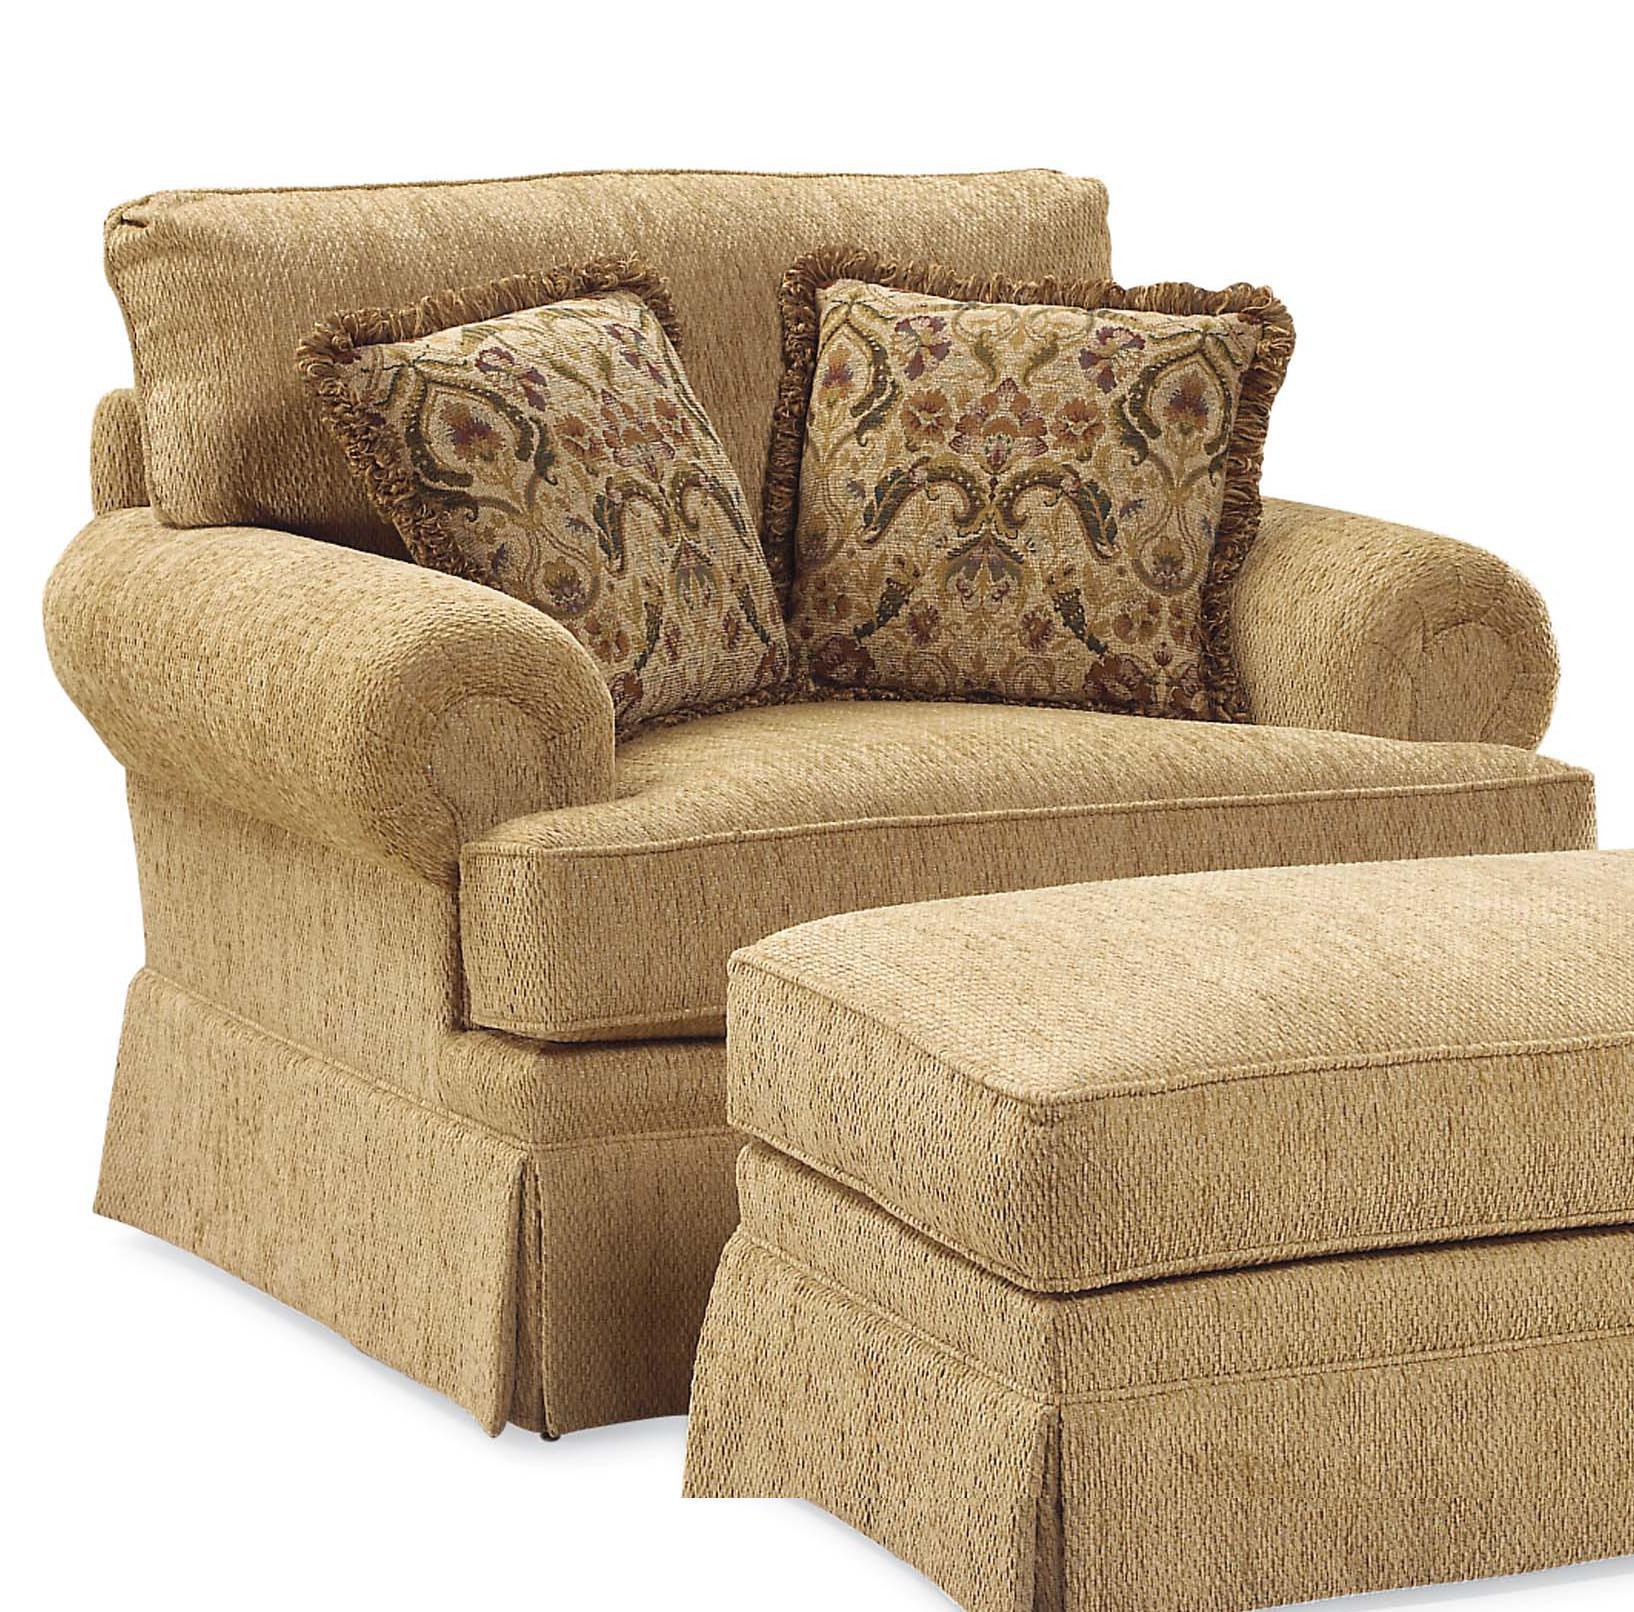 Fairfield 3736 Oversized Skirted Lounge Chair Jacksonville Furniture Mart